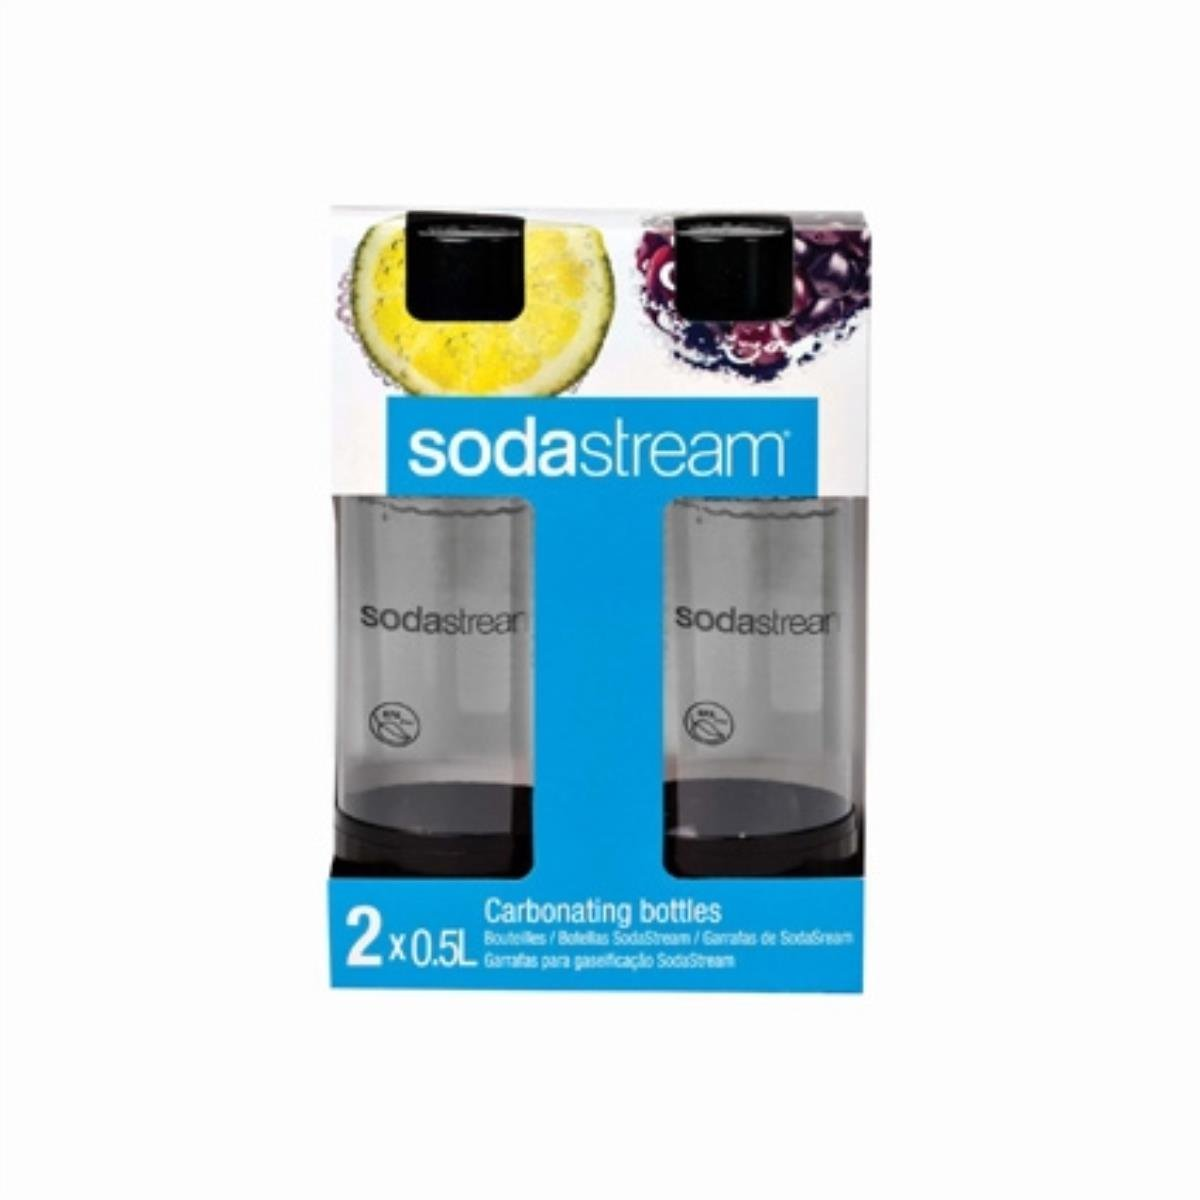 SodaStream 1/2-Liter Carbonating Bottle, Black, 2-Pack